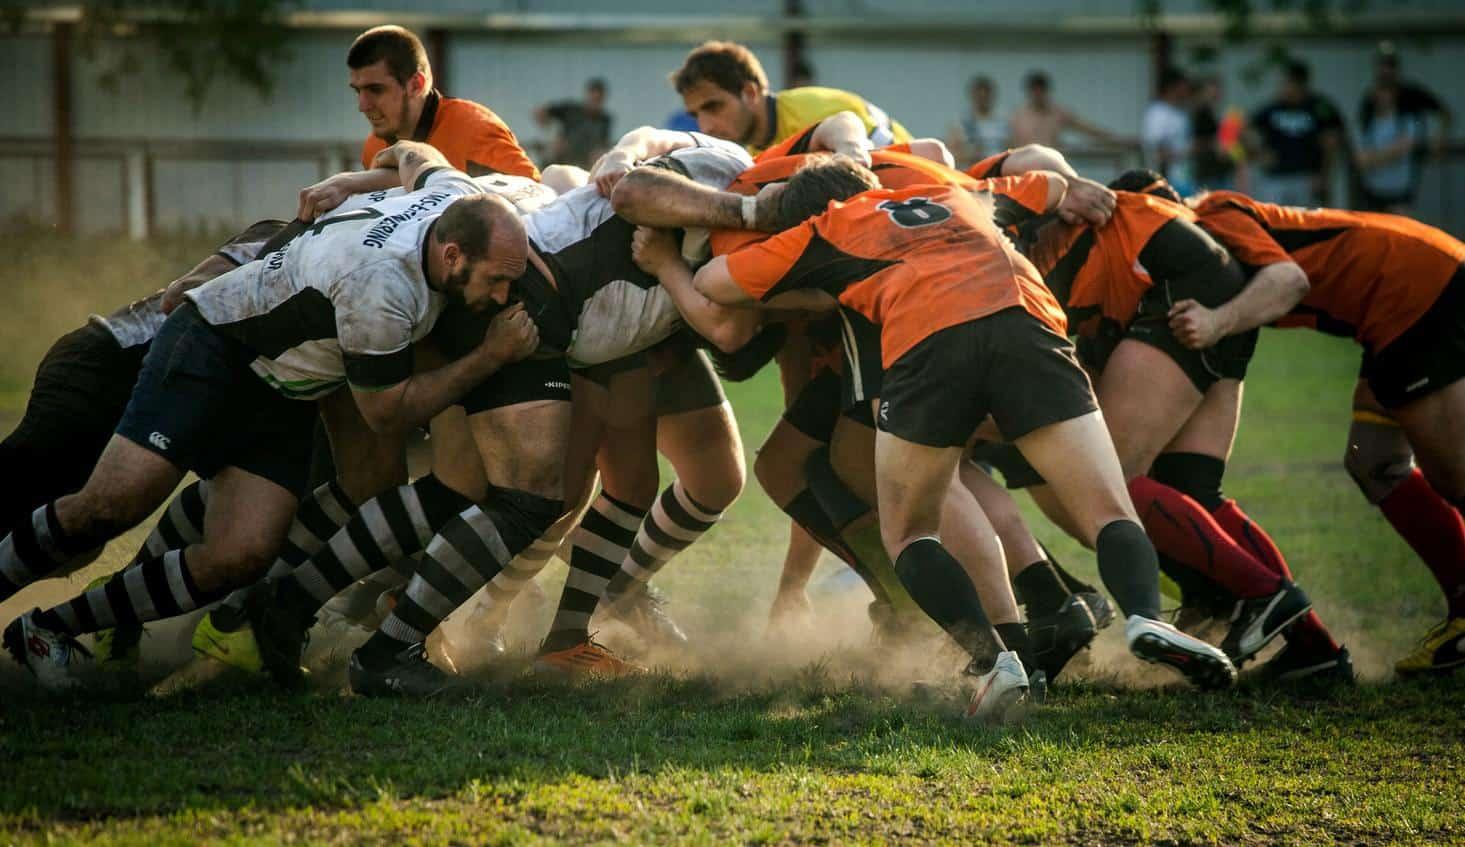 THREE60 SOCIAL TIME – La leadership e la metafora del rugby